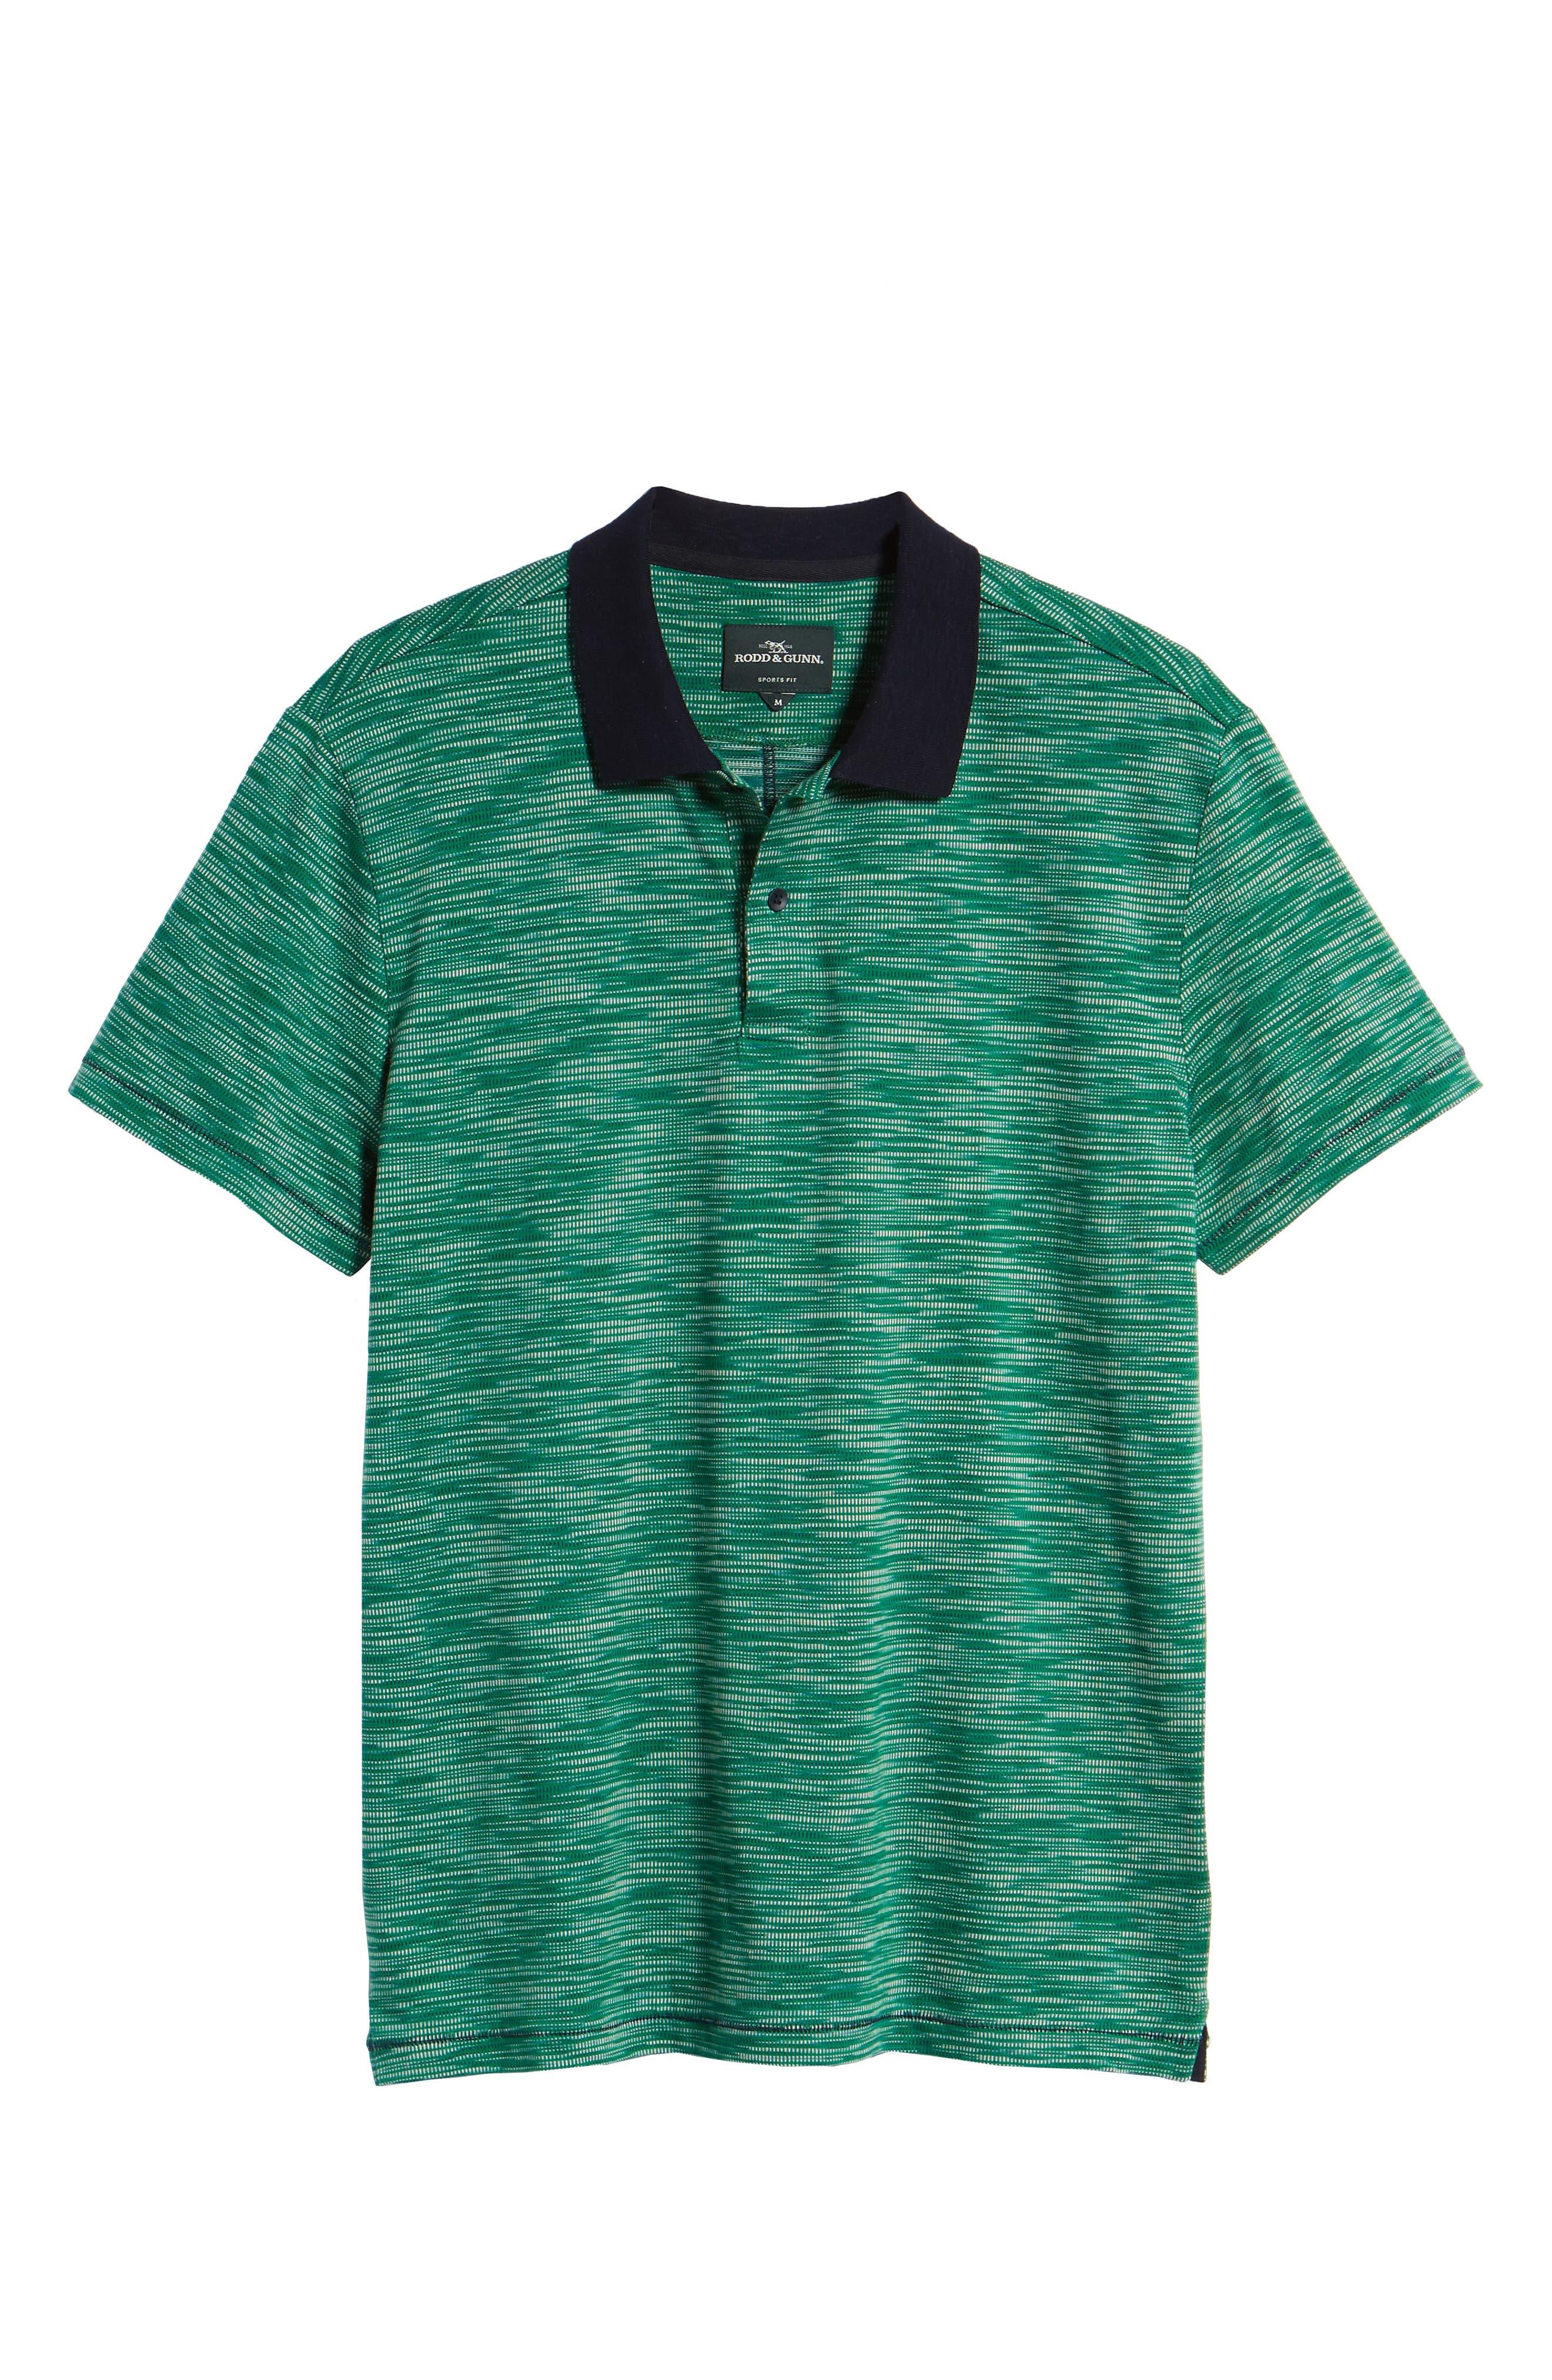 Tay Street Regular Fit Polo,                             Alternate thumbnail 6, color,                             341